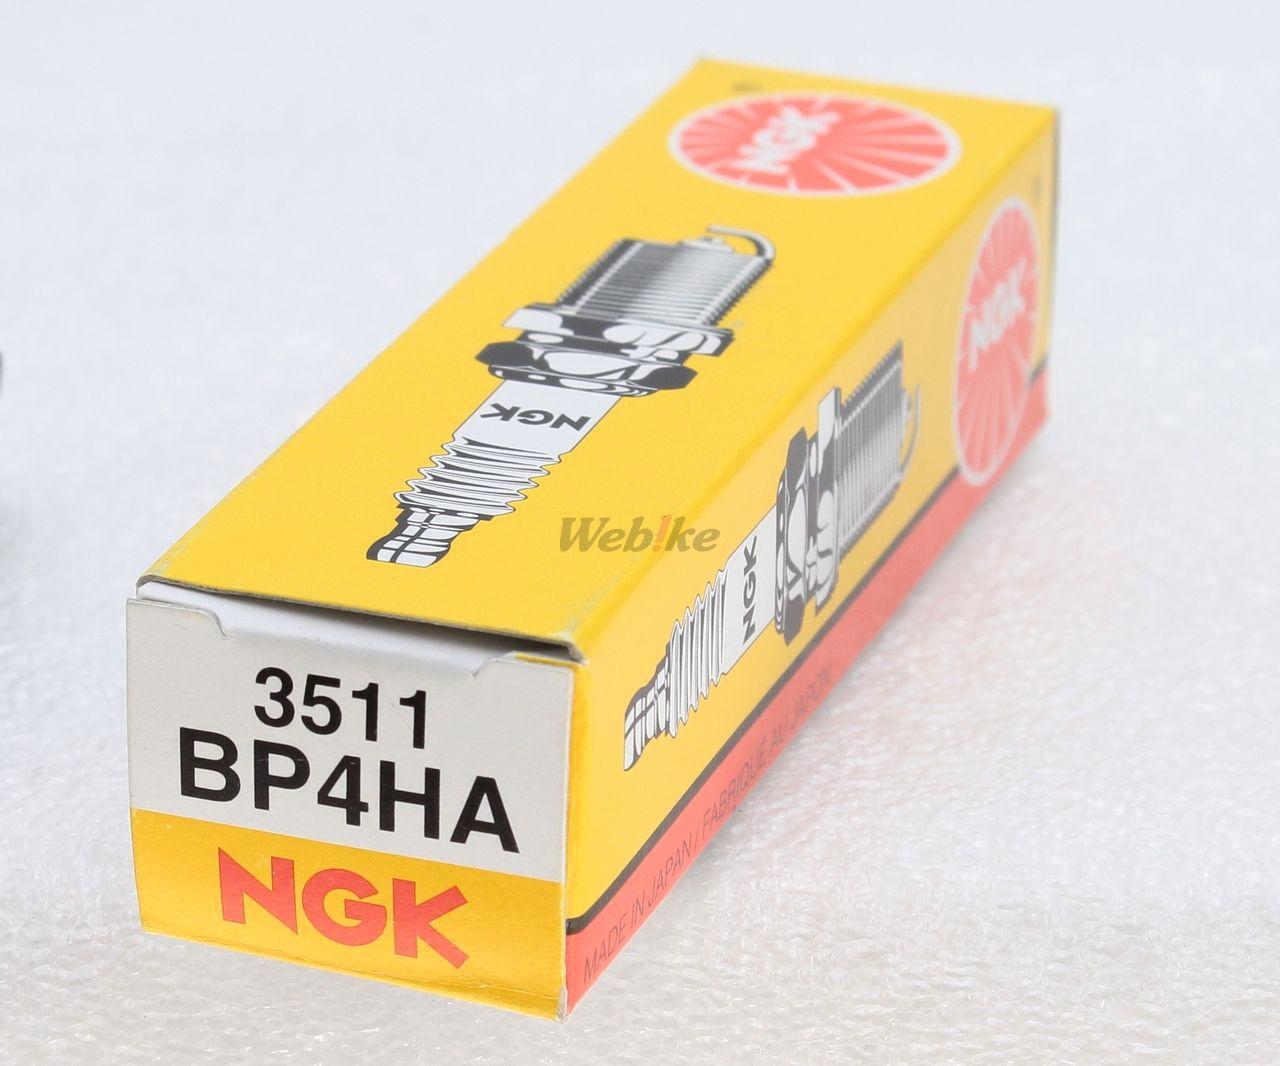 【NGK】標準型 火星塞 BP4HA 3511 - 「Webike-摩托百貨」